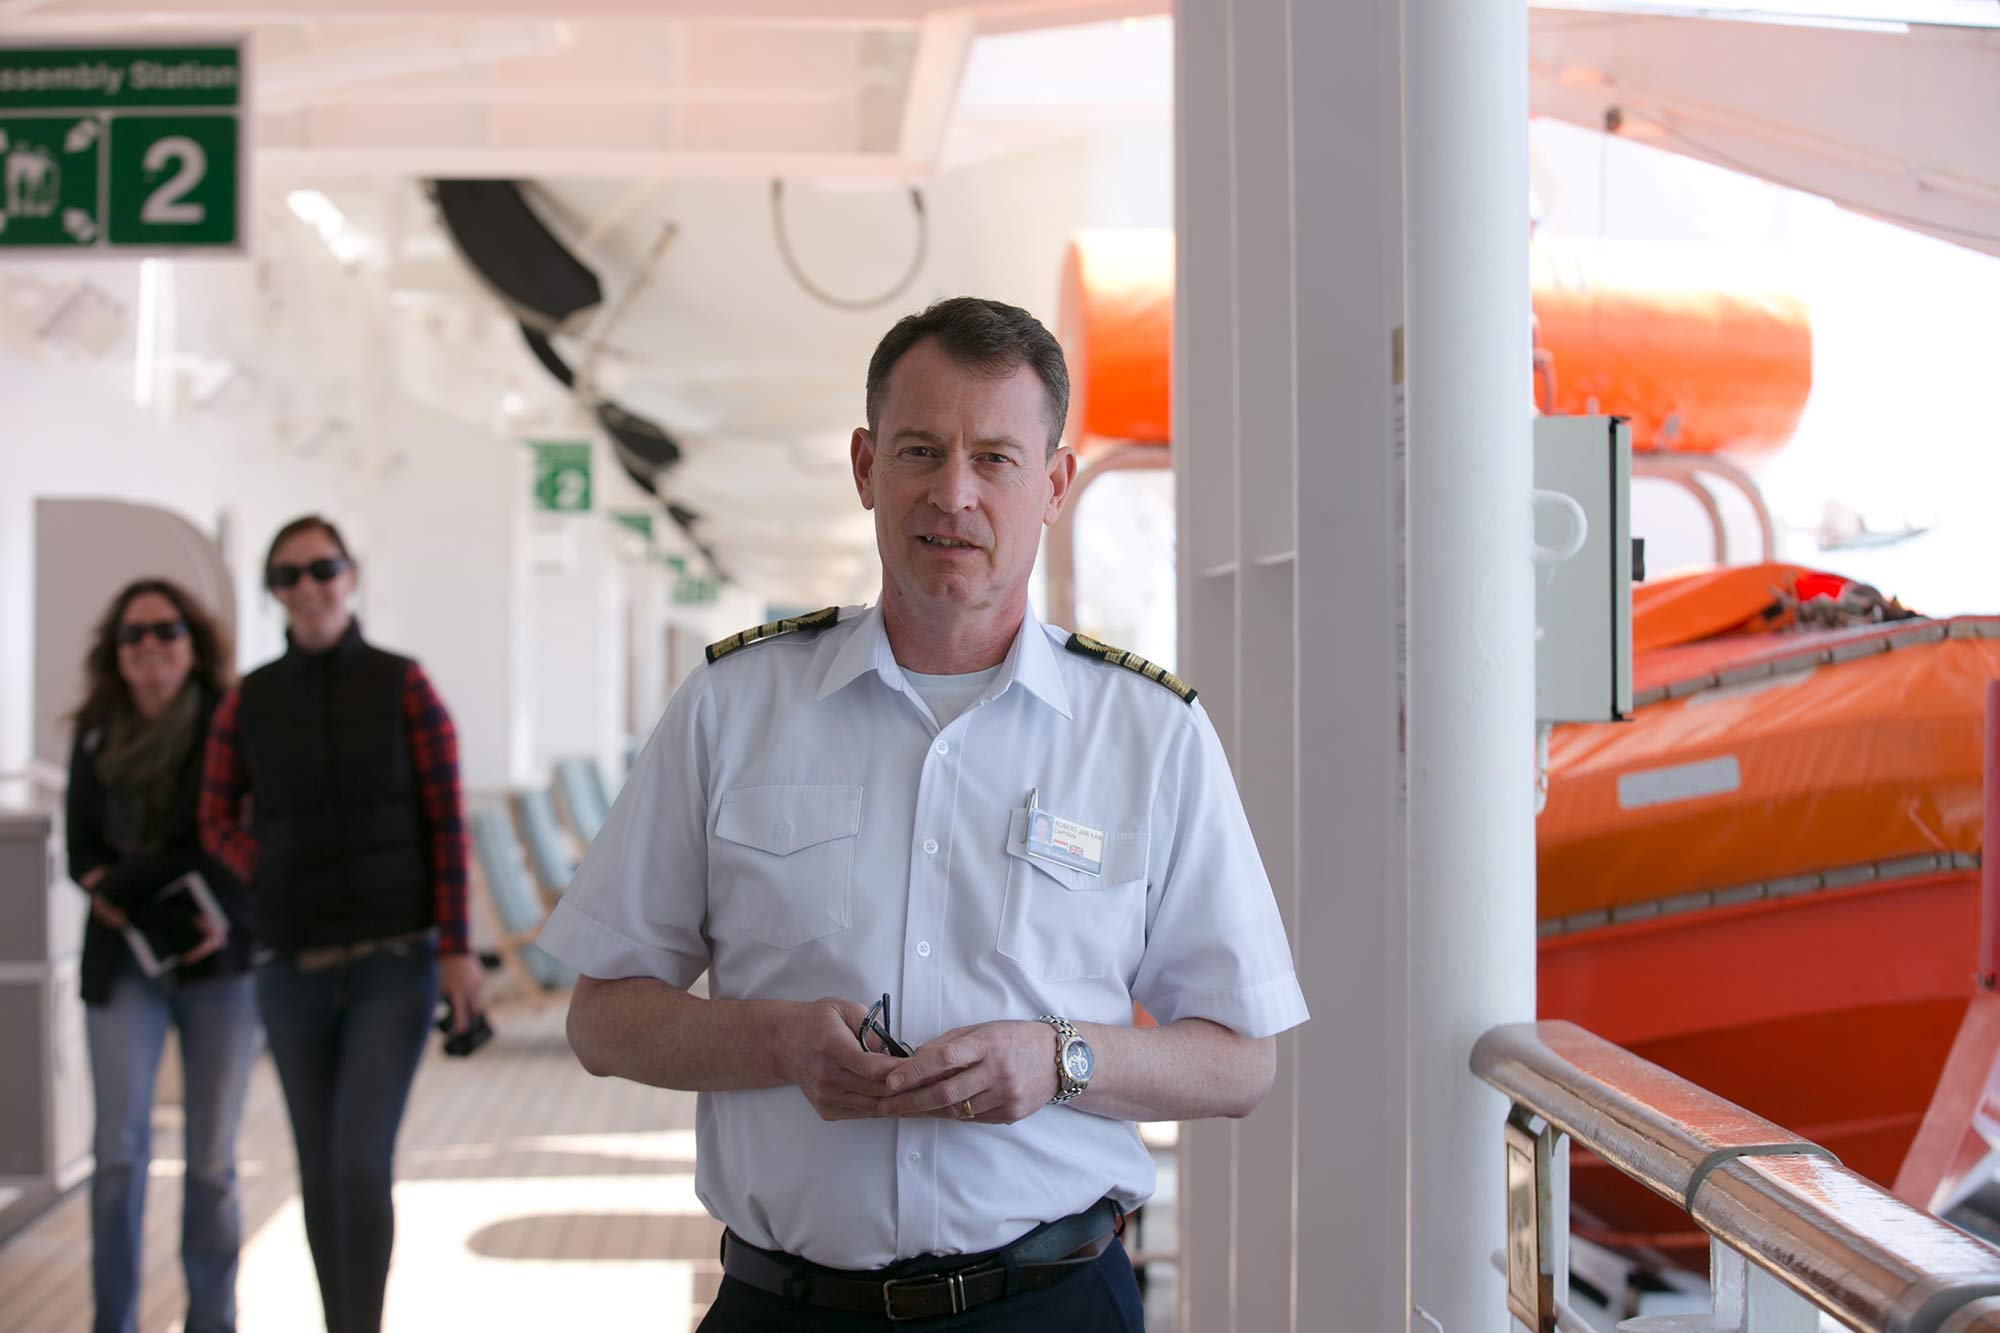 Robert Jan Kan, captain of Oosterdam